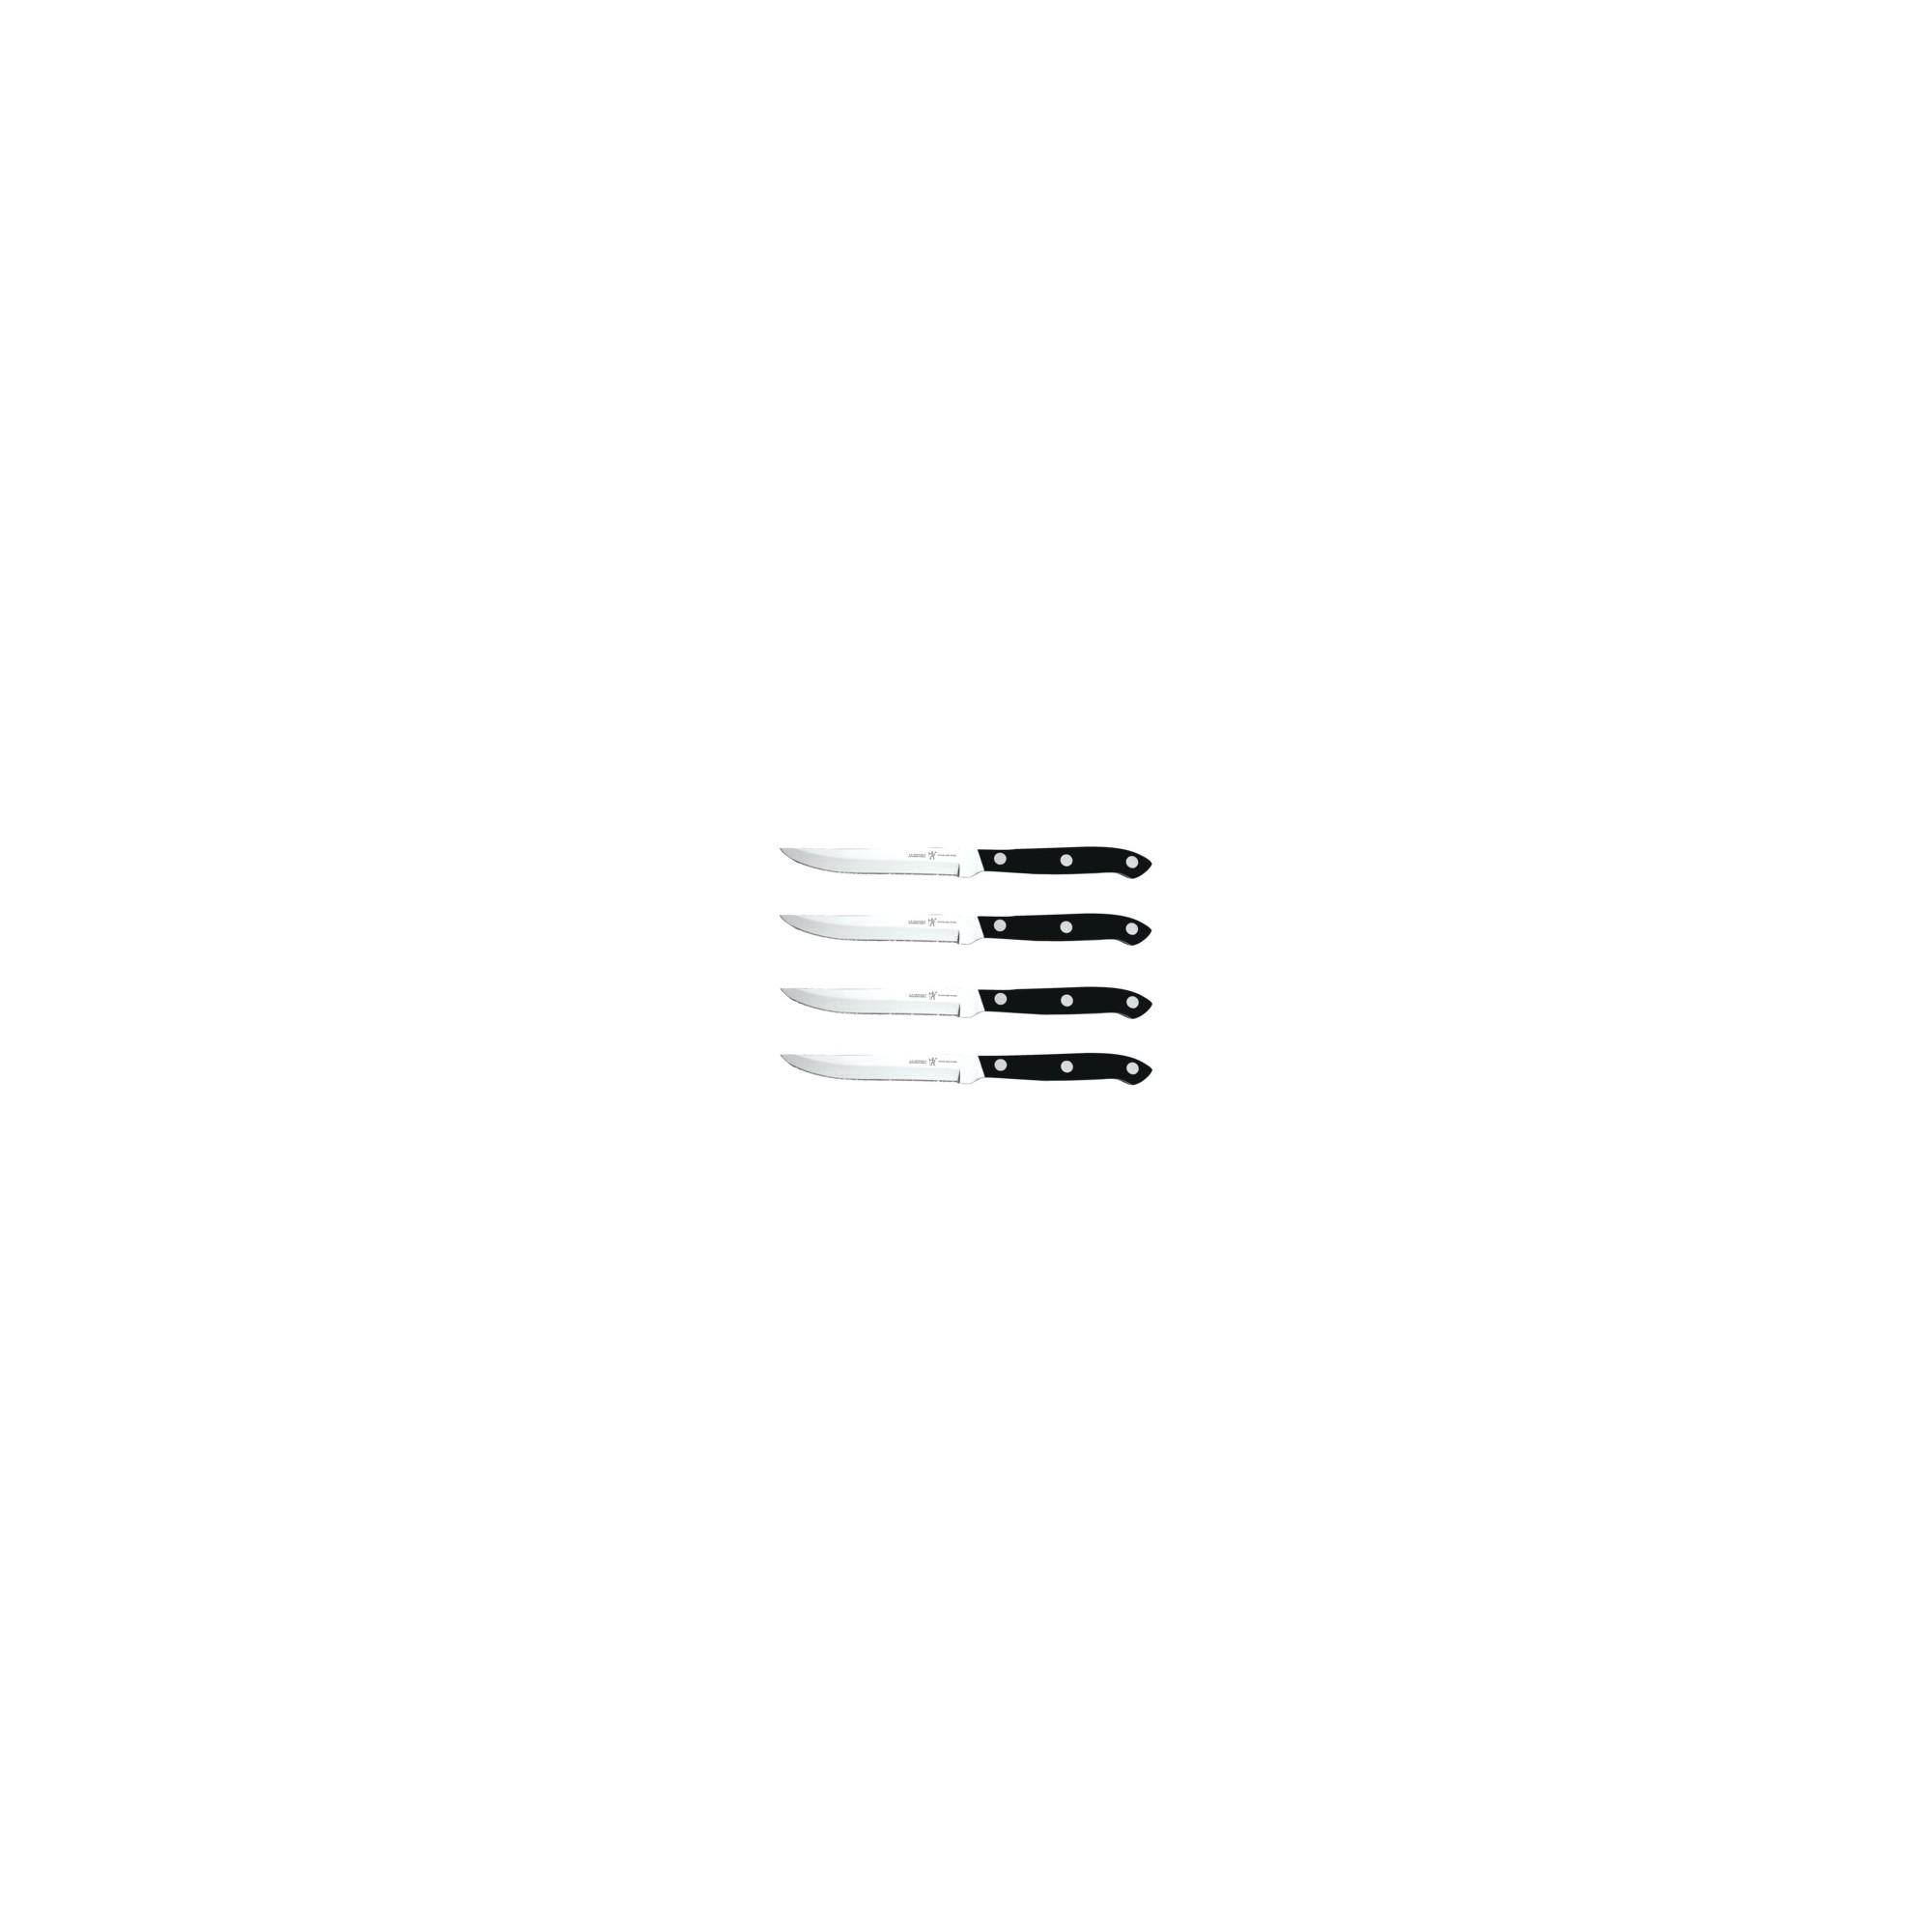 J.A. Henckels Prime 4-pc. Steak Knife Set